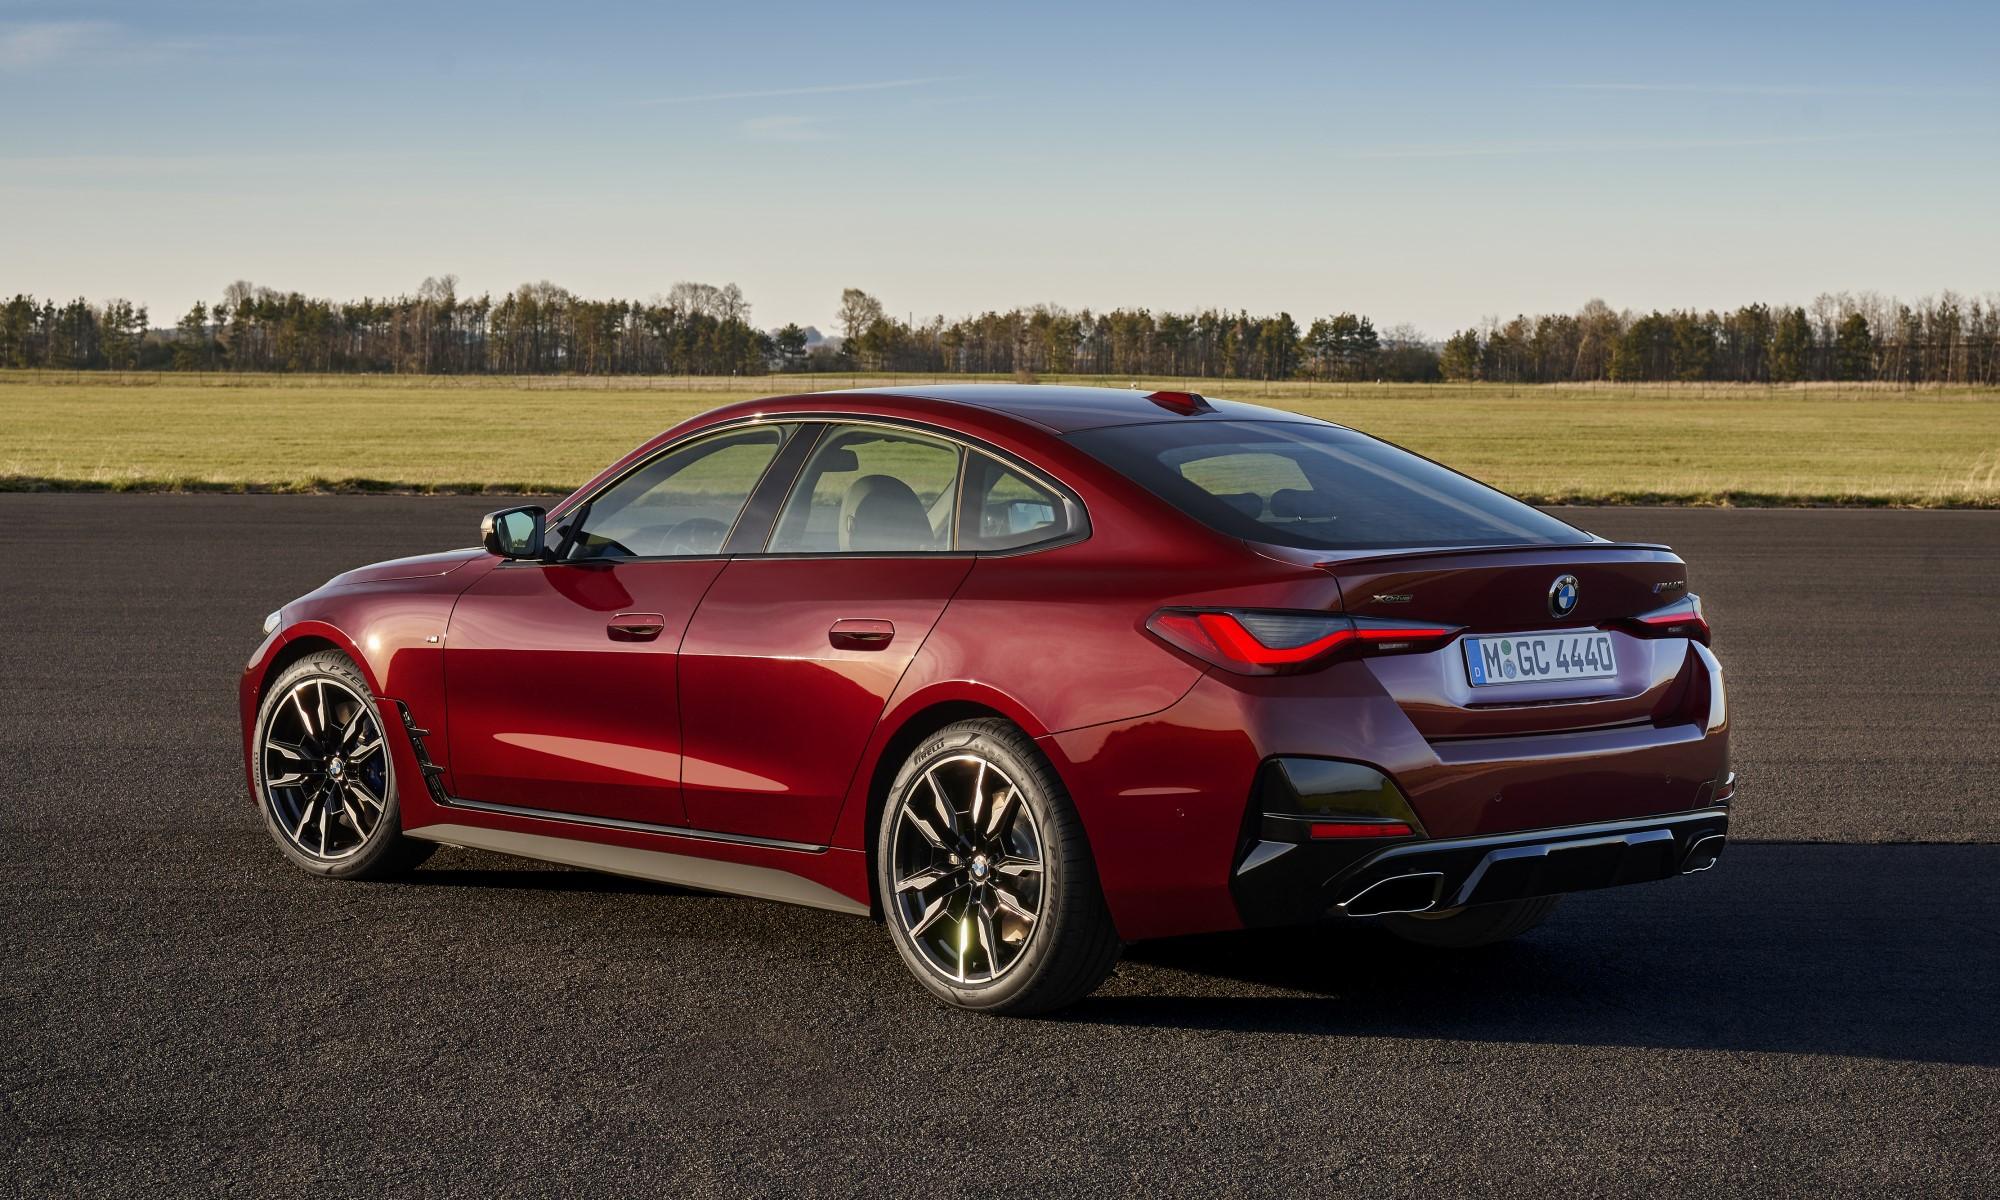 New BMW Models BMW 4 Series Gran Coupe rear